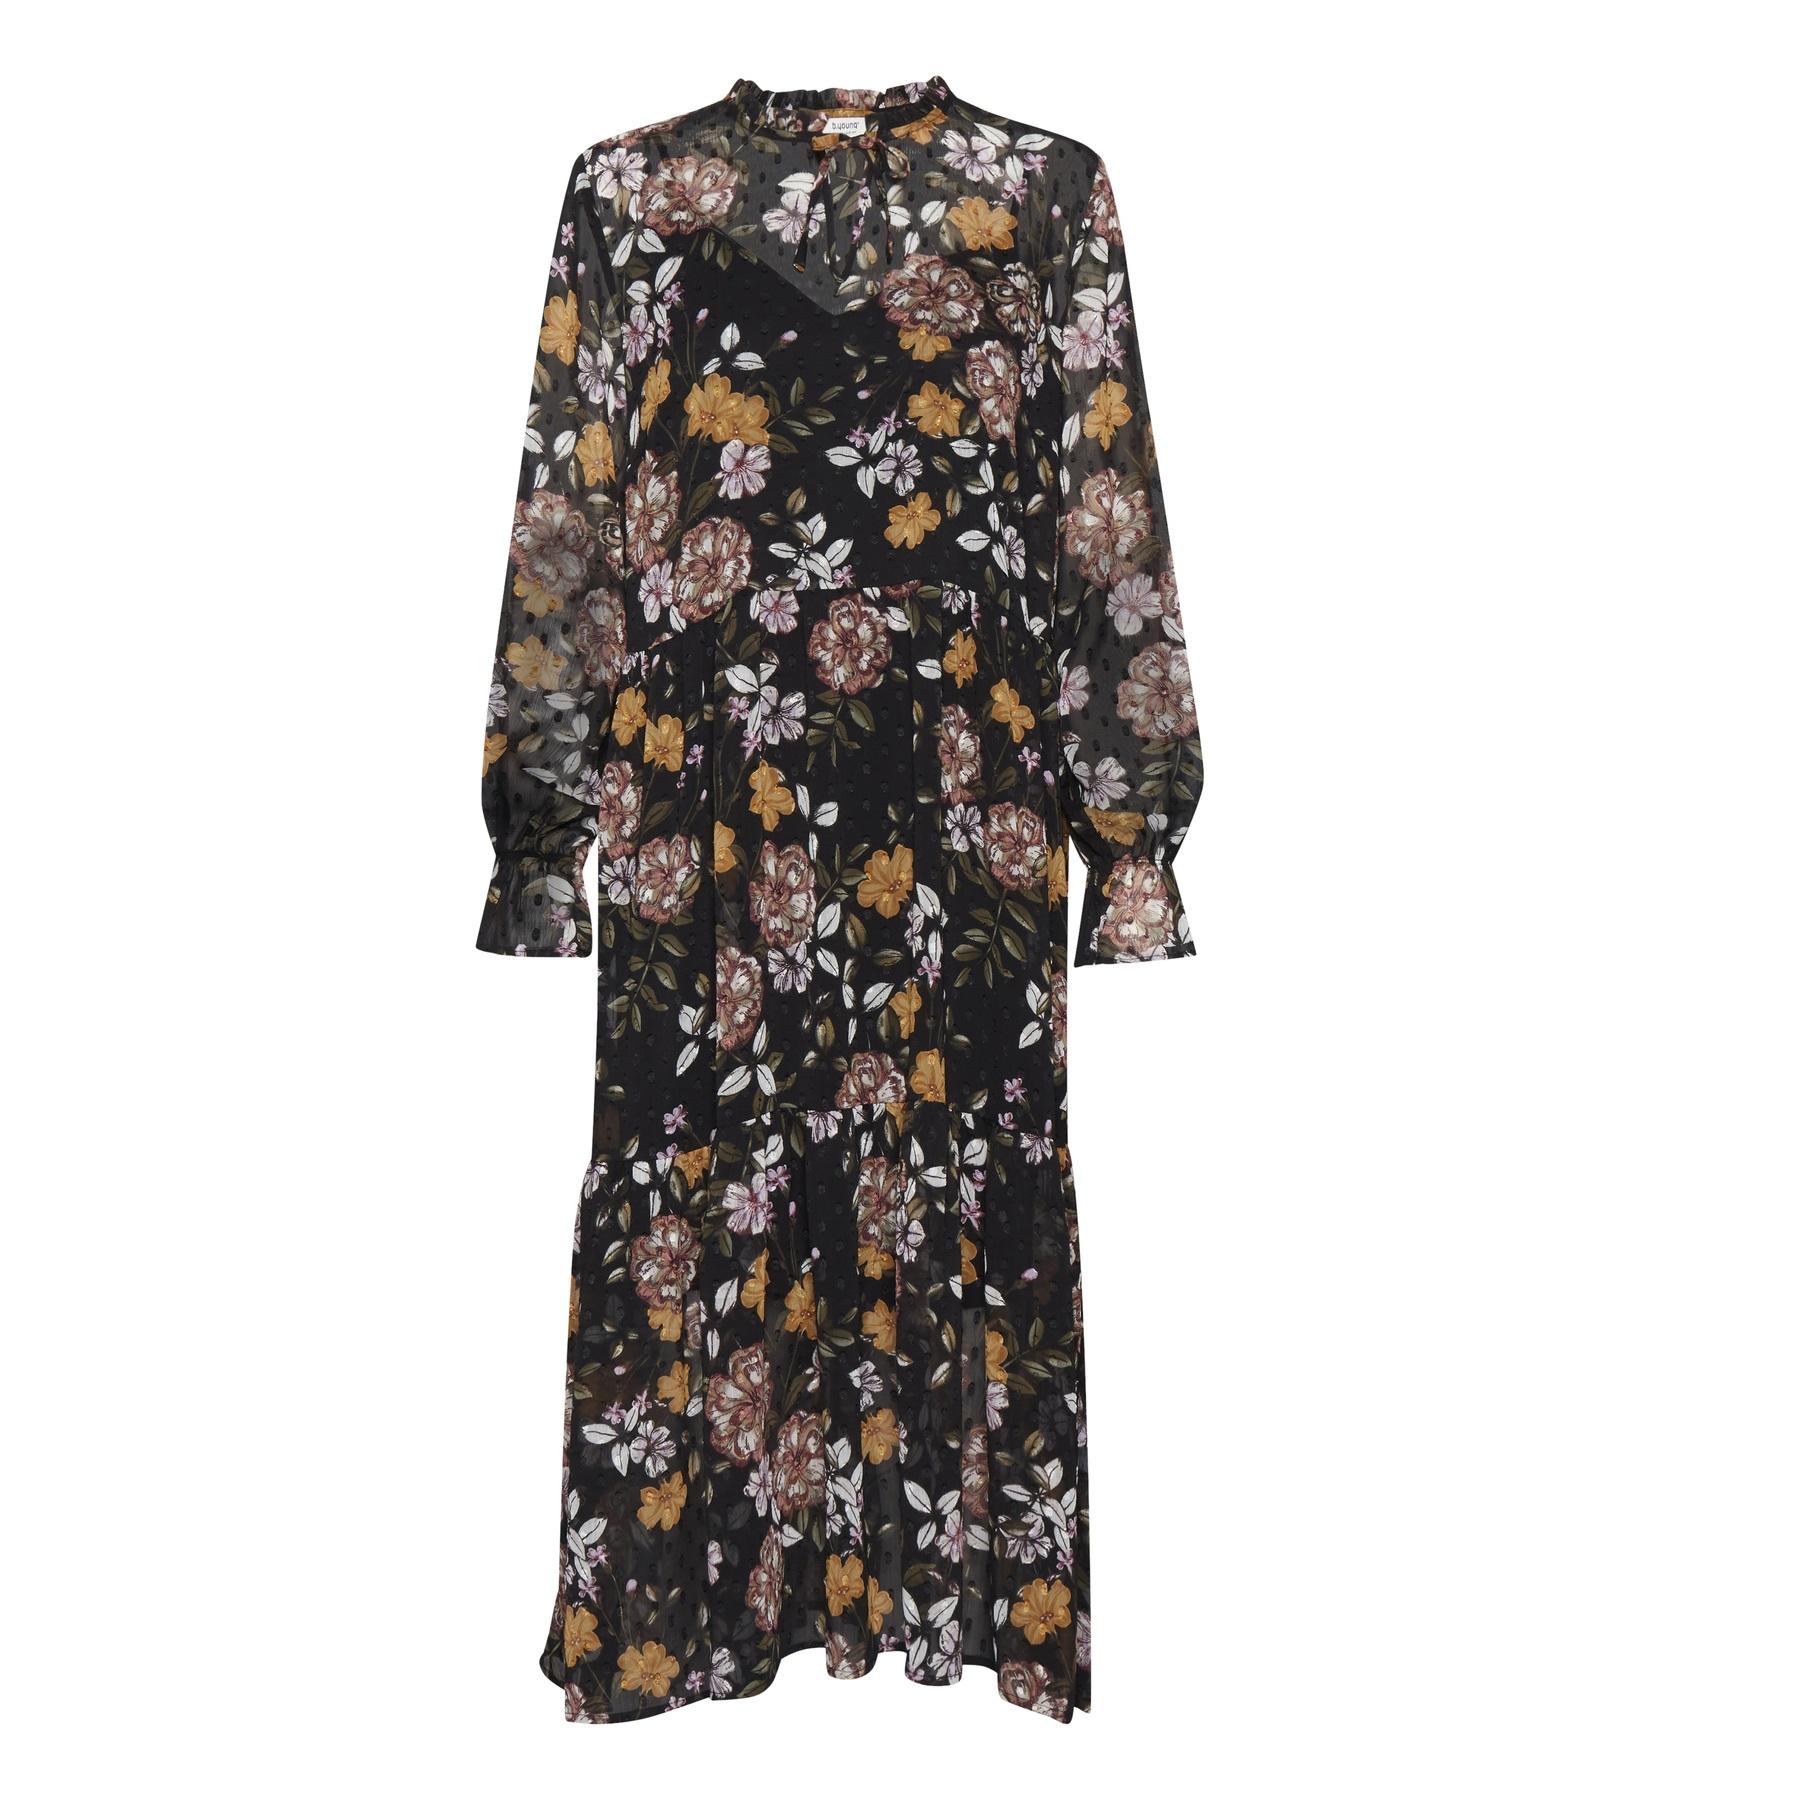 SALE Ginni Dress was  £69.99